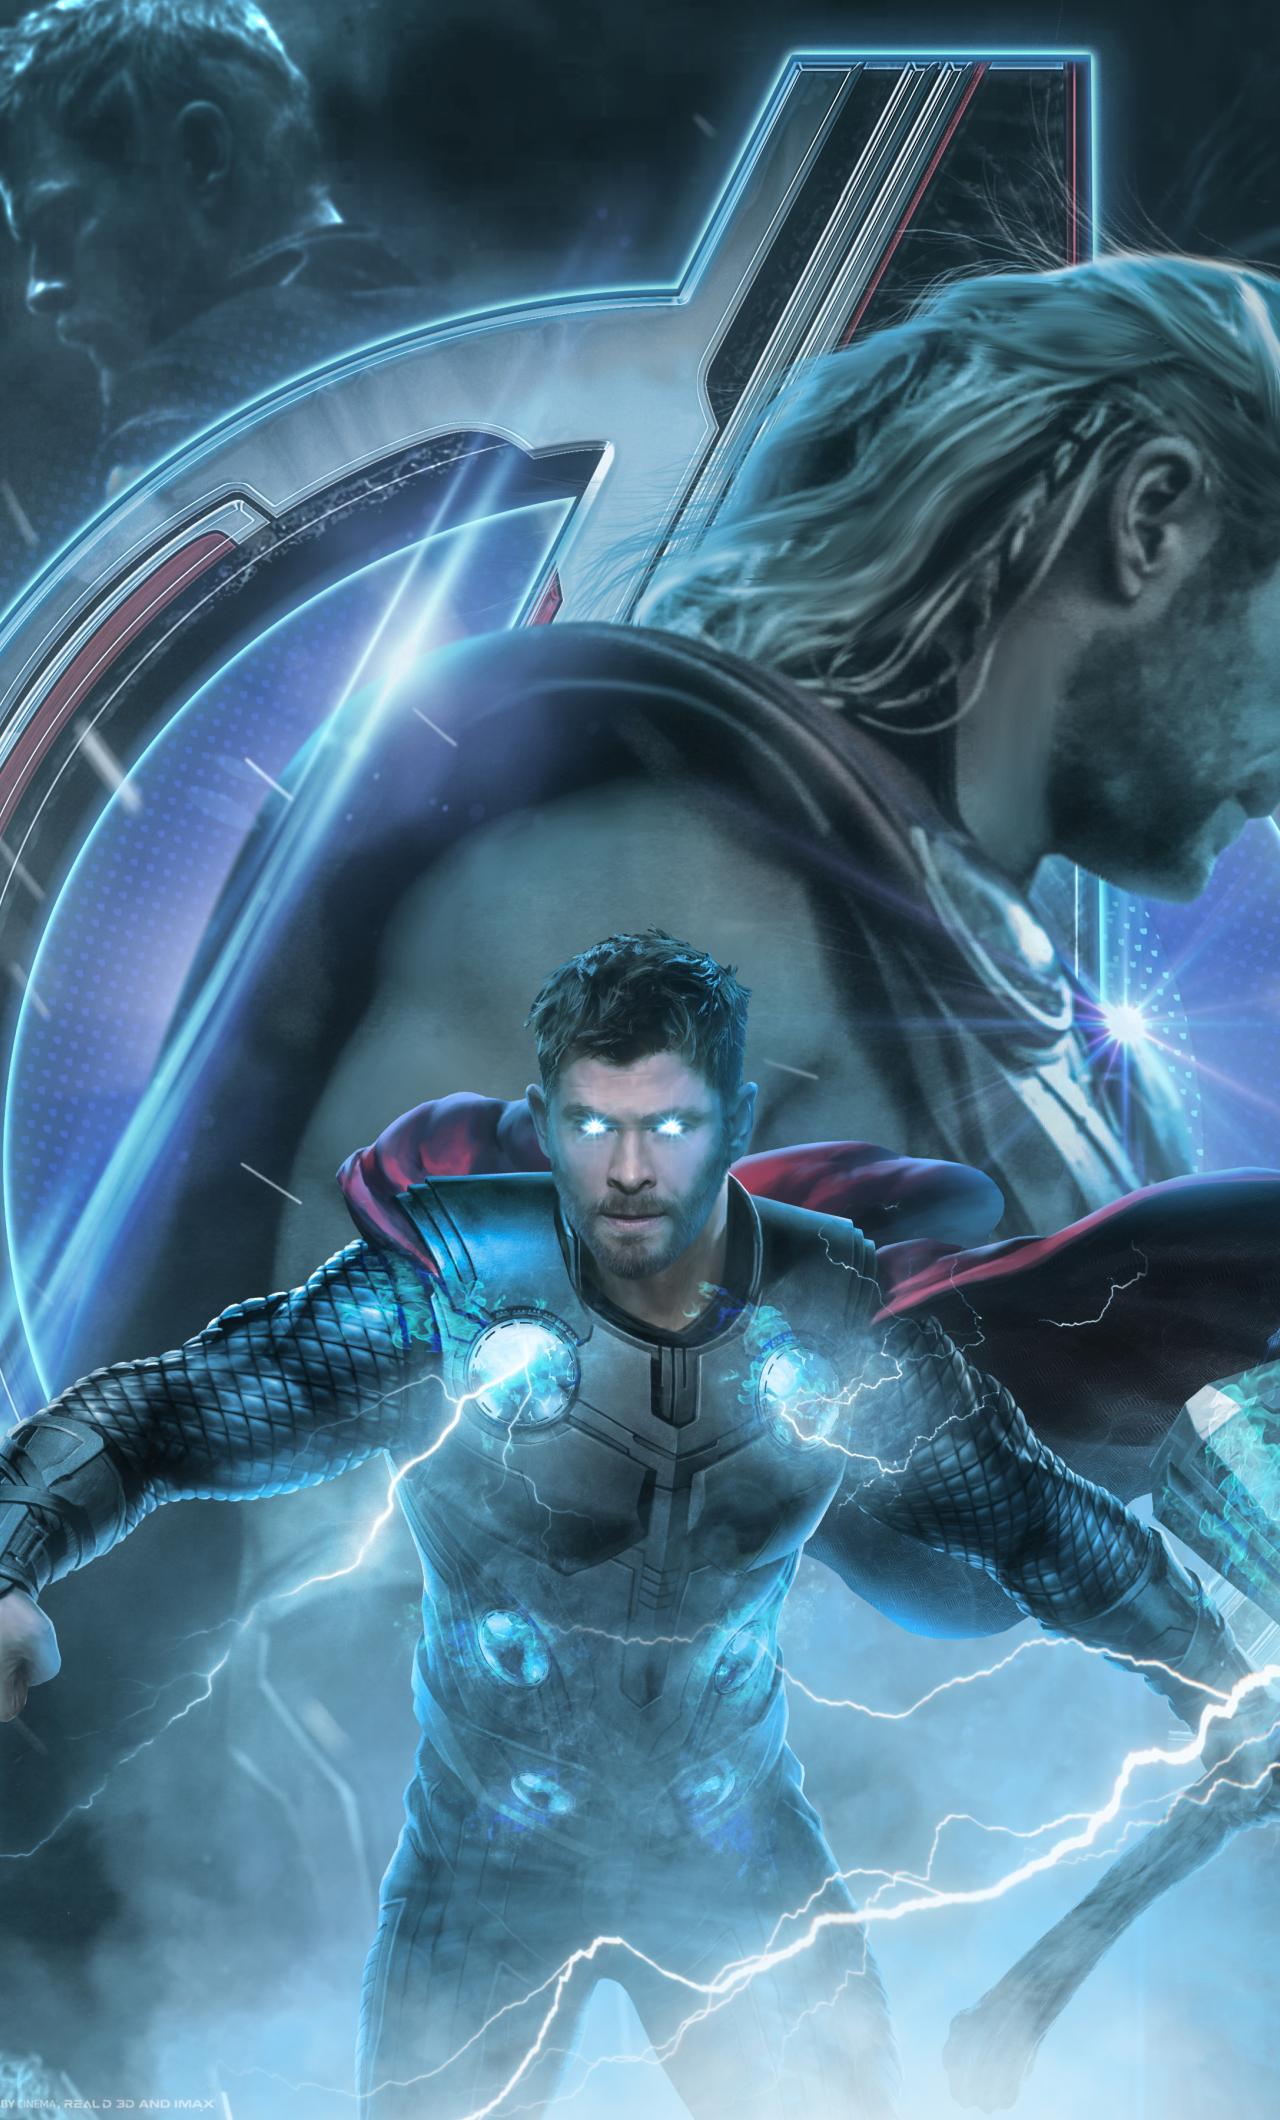 1280x2120 Avengers Endgame Thor Poster Artwork Iphone 6 Plus